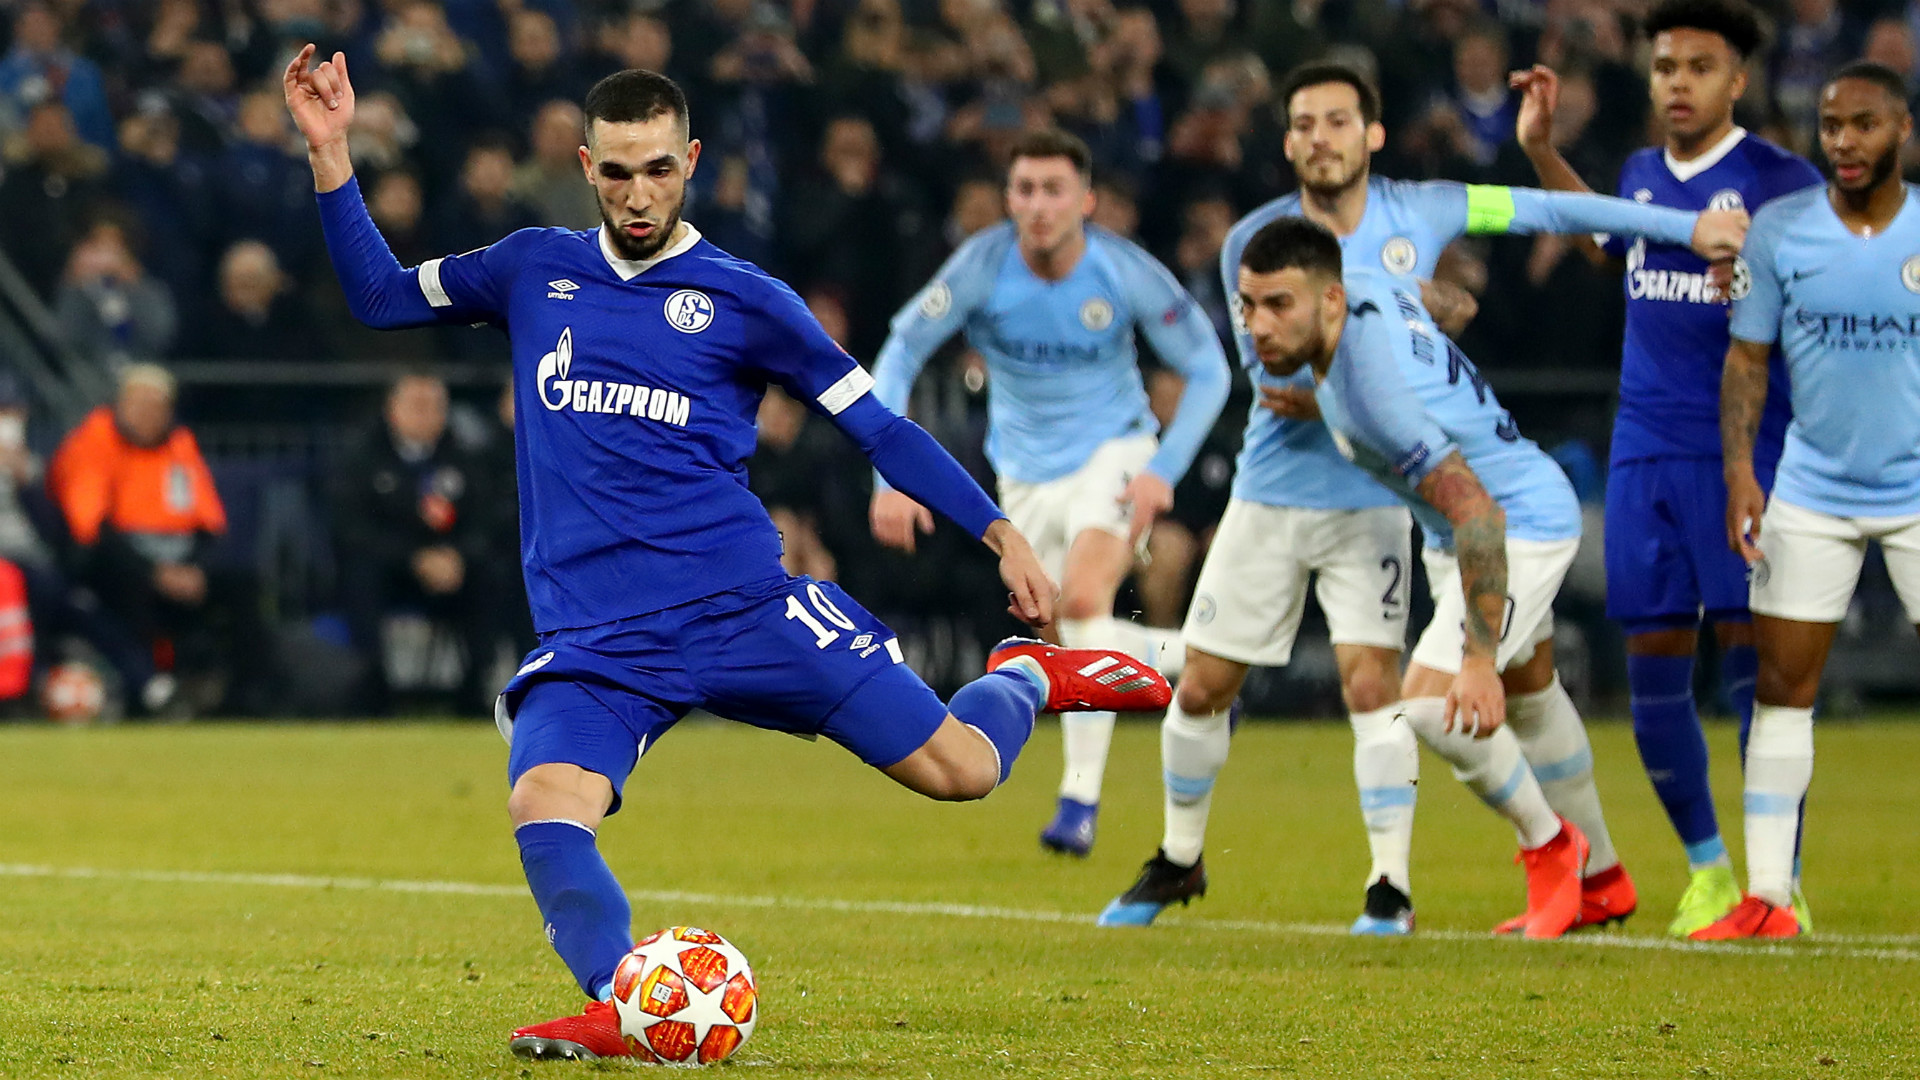 Nabil Bentaleb Schalke 2018-19